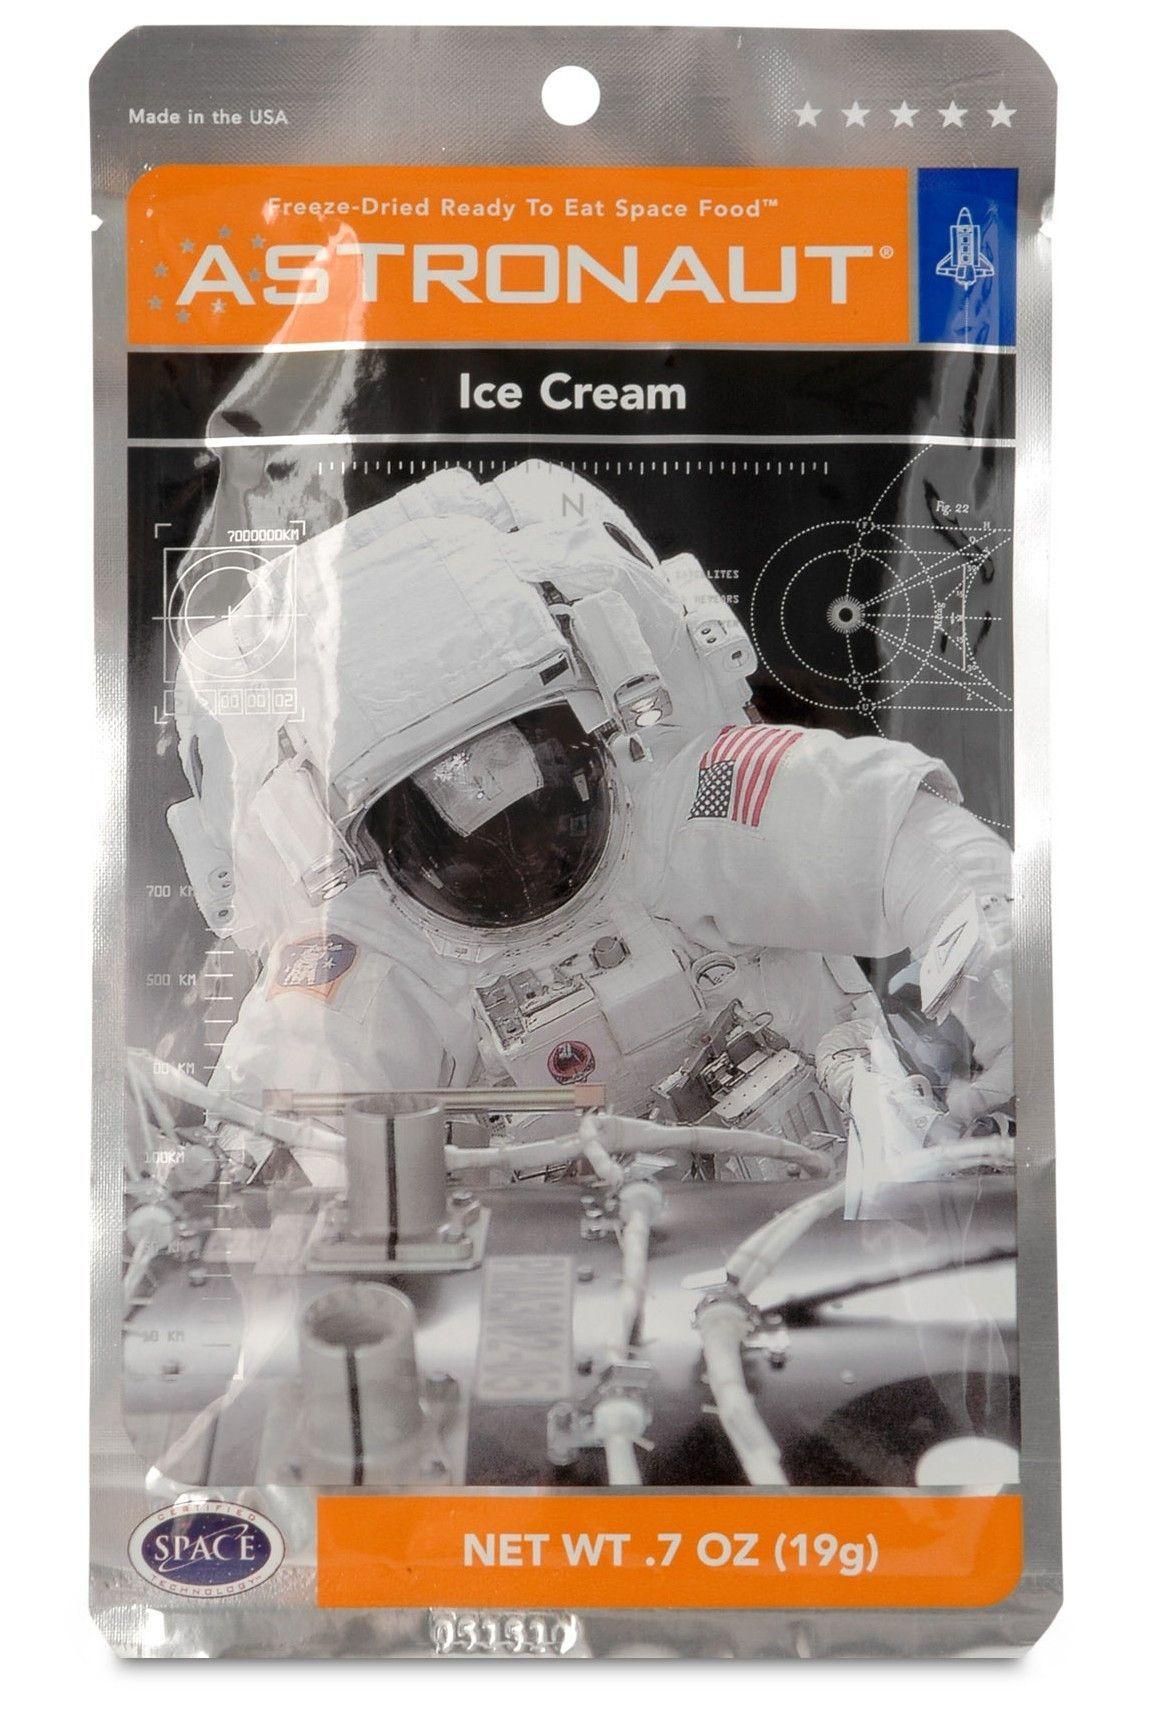 Astronaut space food ice cream sandwich freeze dried ice